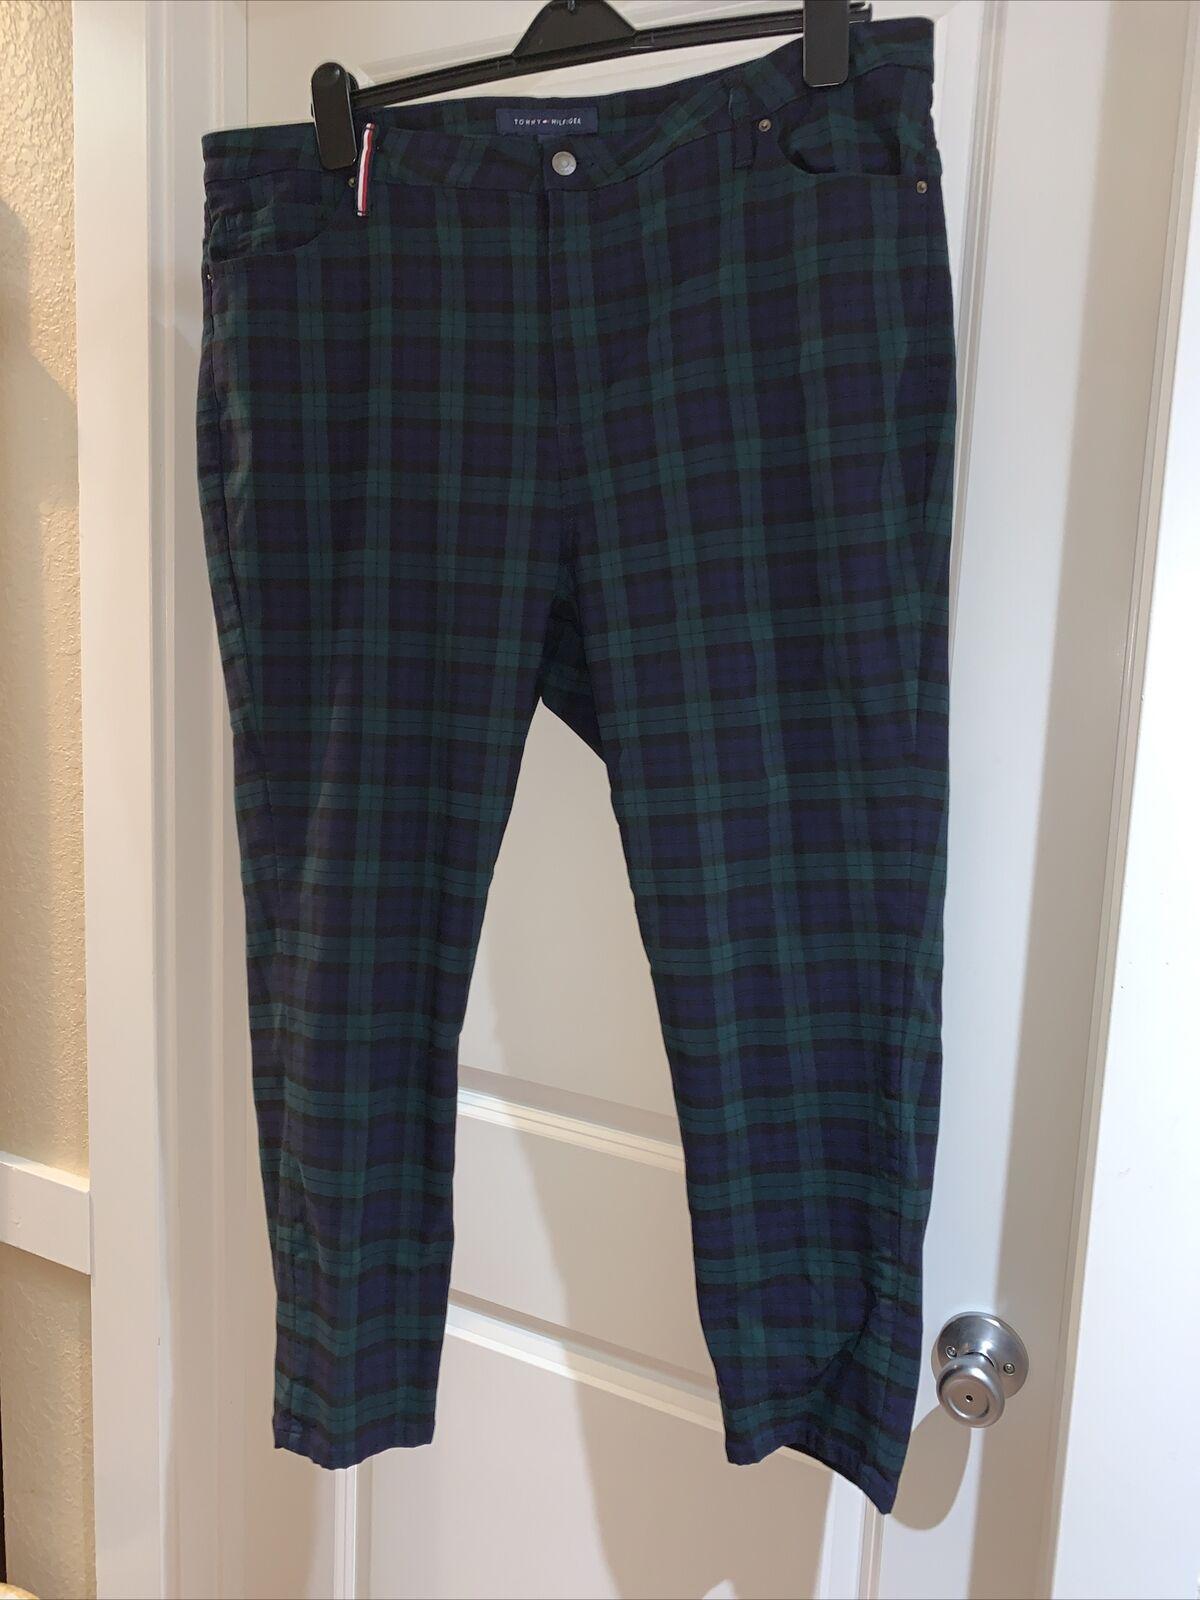 TOMMY HILFIGER Blue green plaid Pants zip front … - image 1